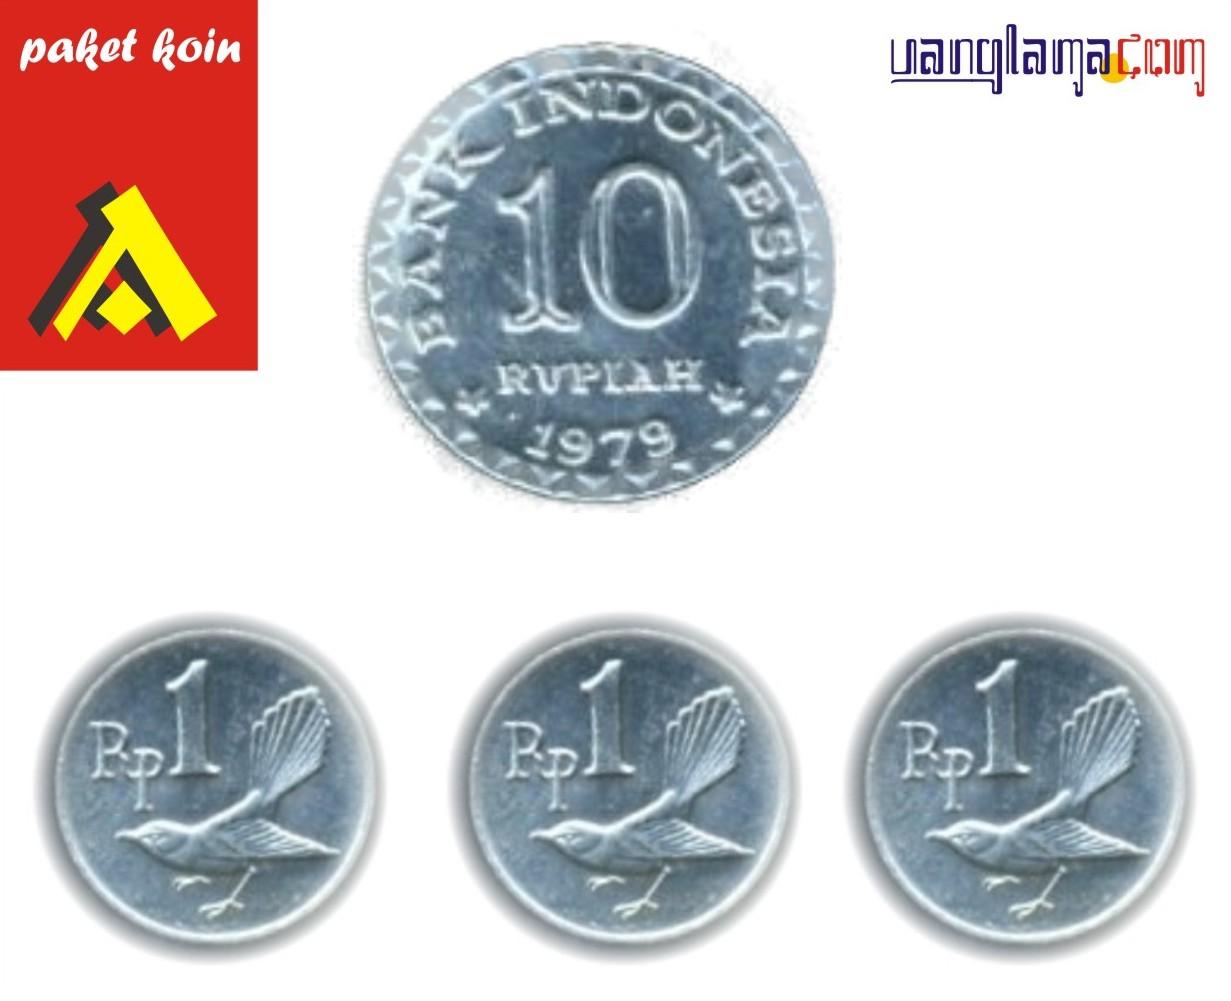 Paket Koin 13 Rupiah A